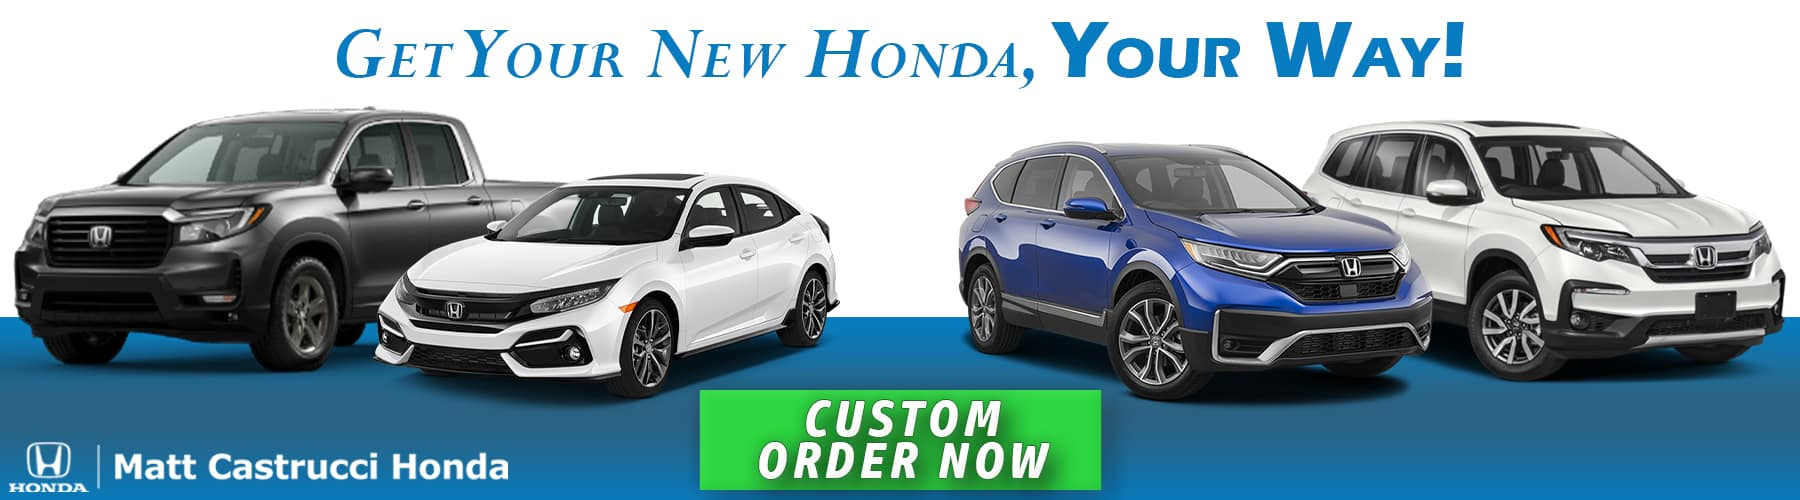 MCA Honda Custom Slider REV